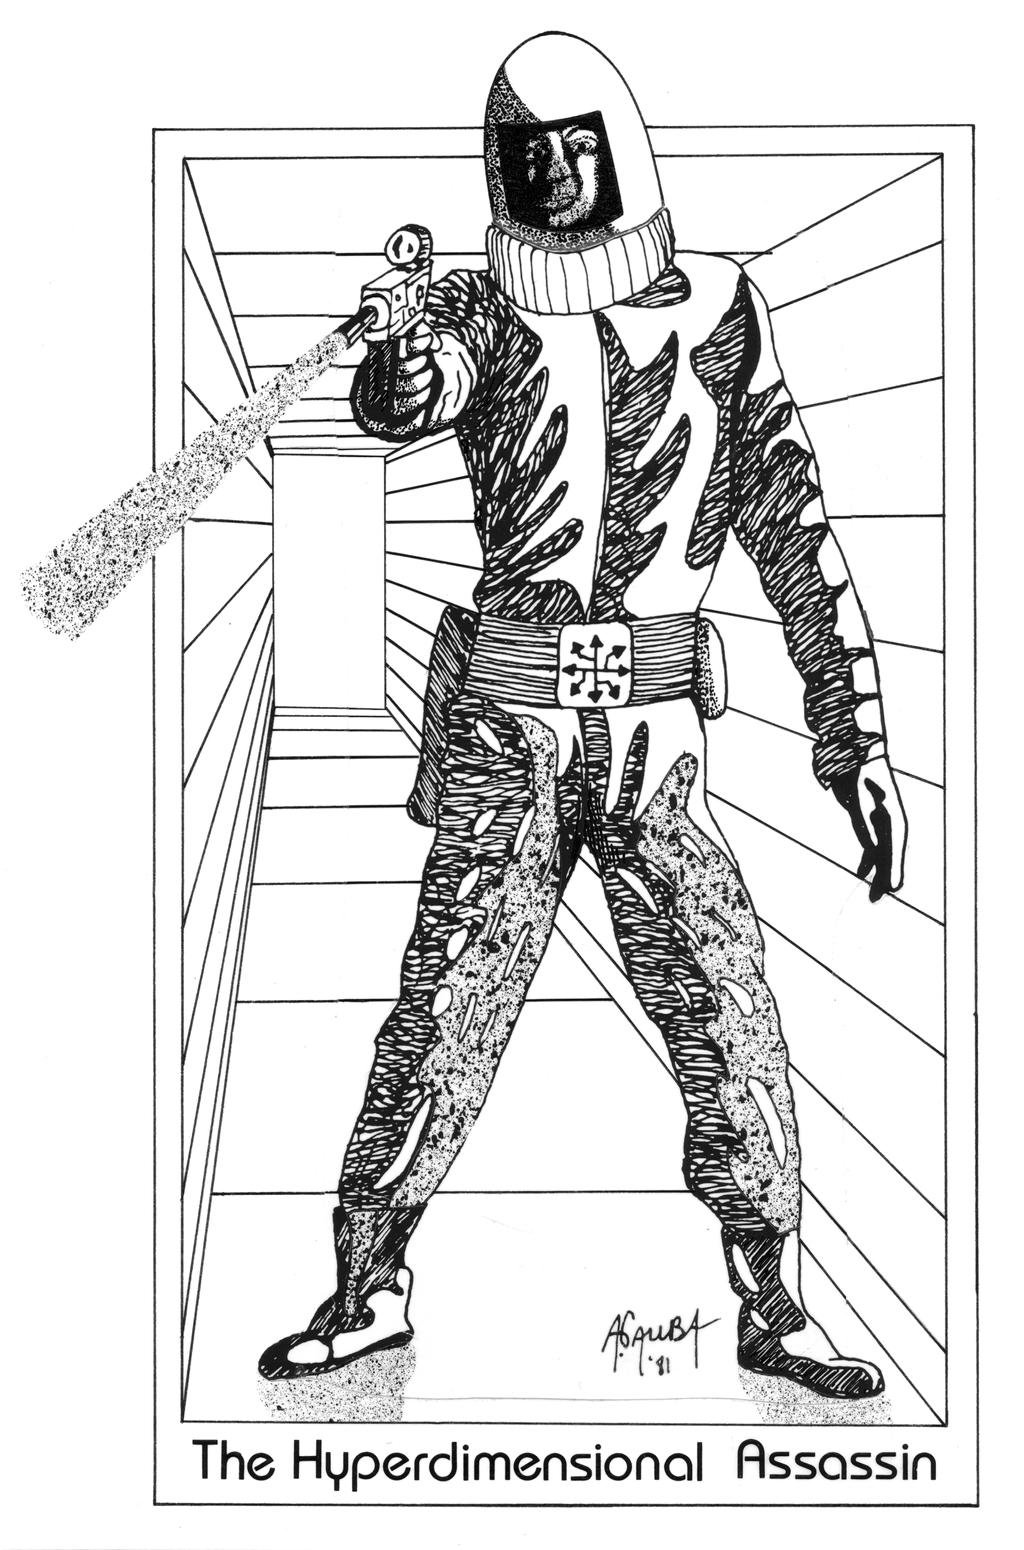 The Hyperdimensional Assassin